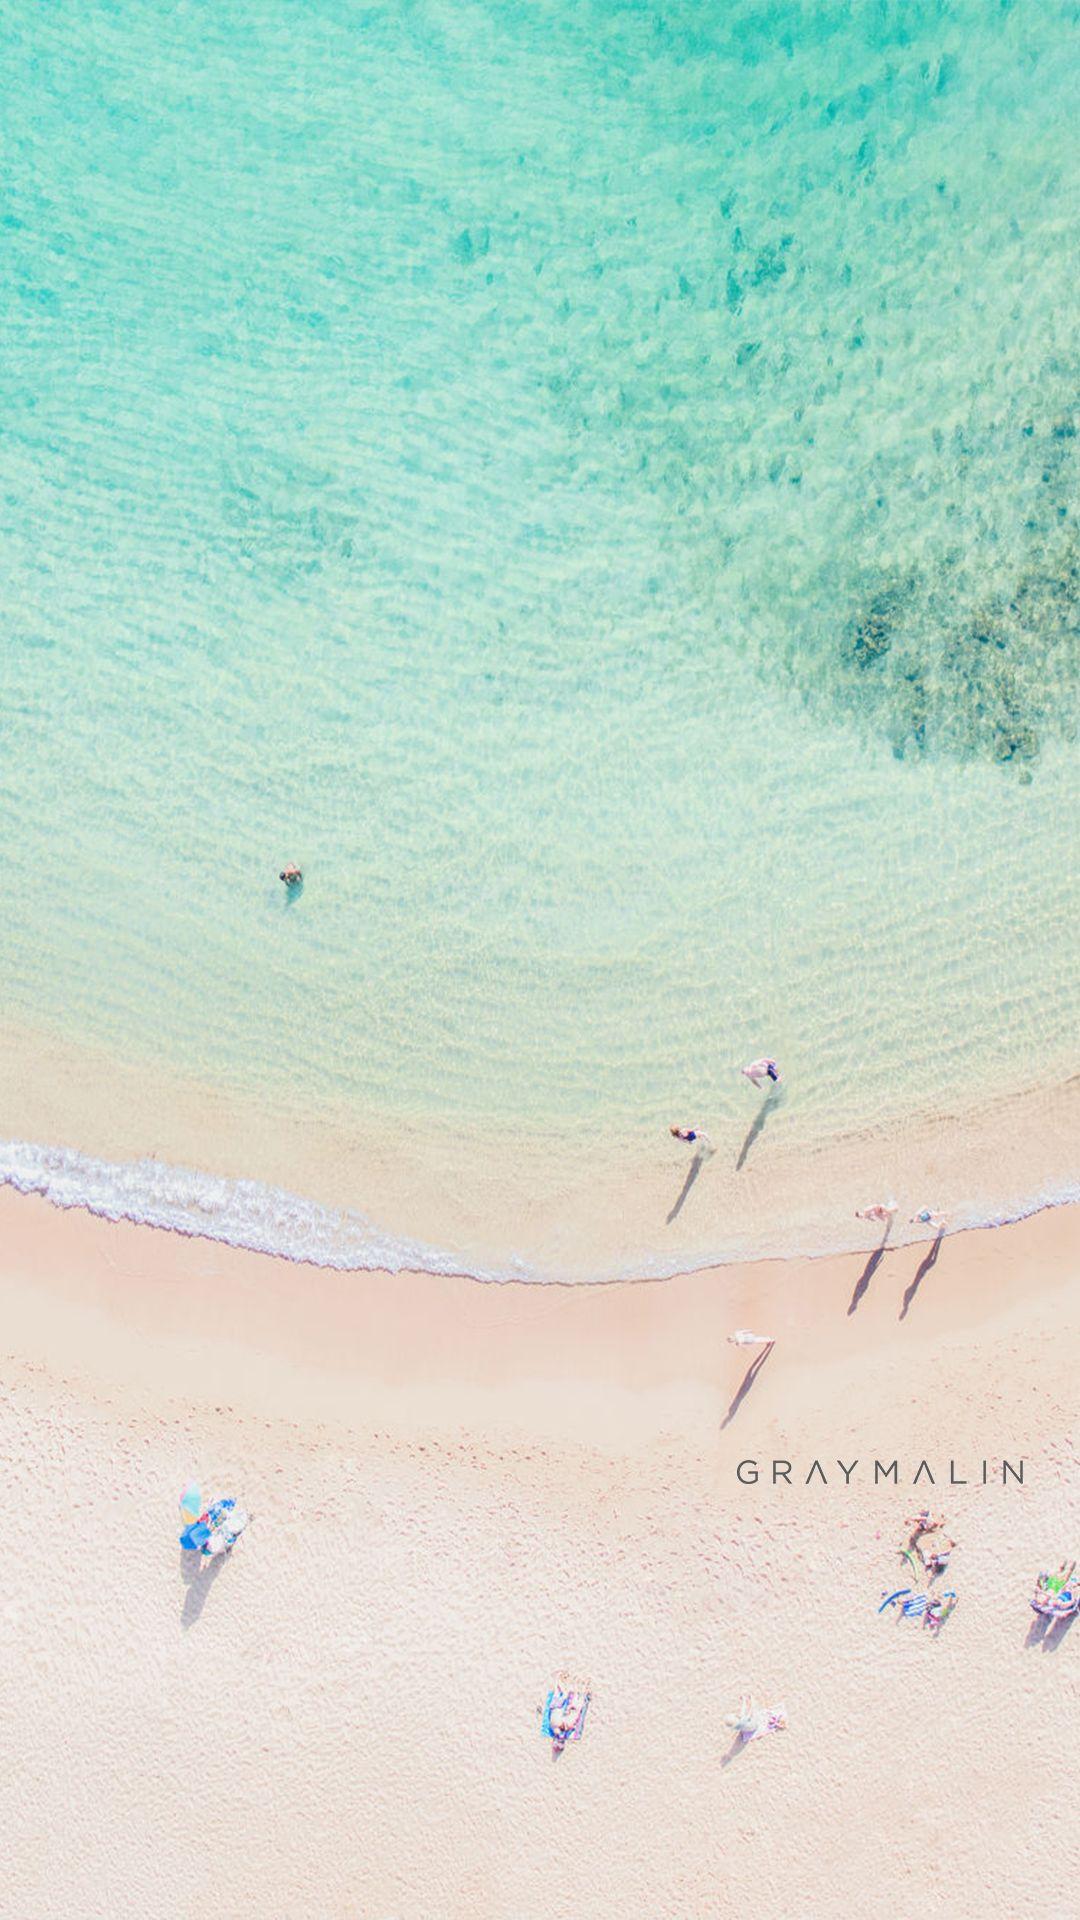 Gray Malin Desktop Wallpaper : malin, desktop, wallpaper, Phone, Backgrounds, Malin